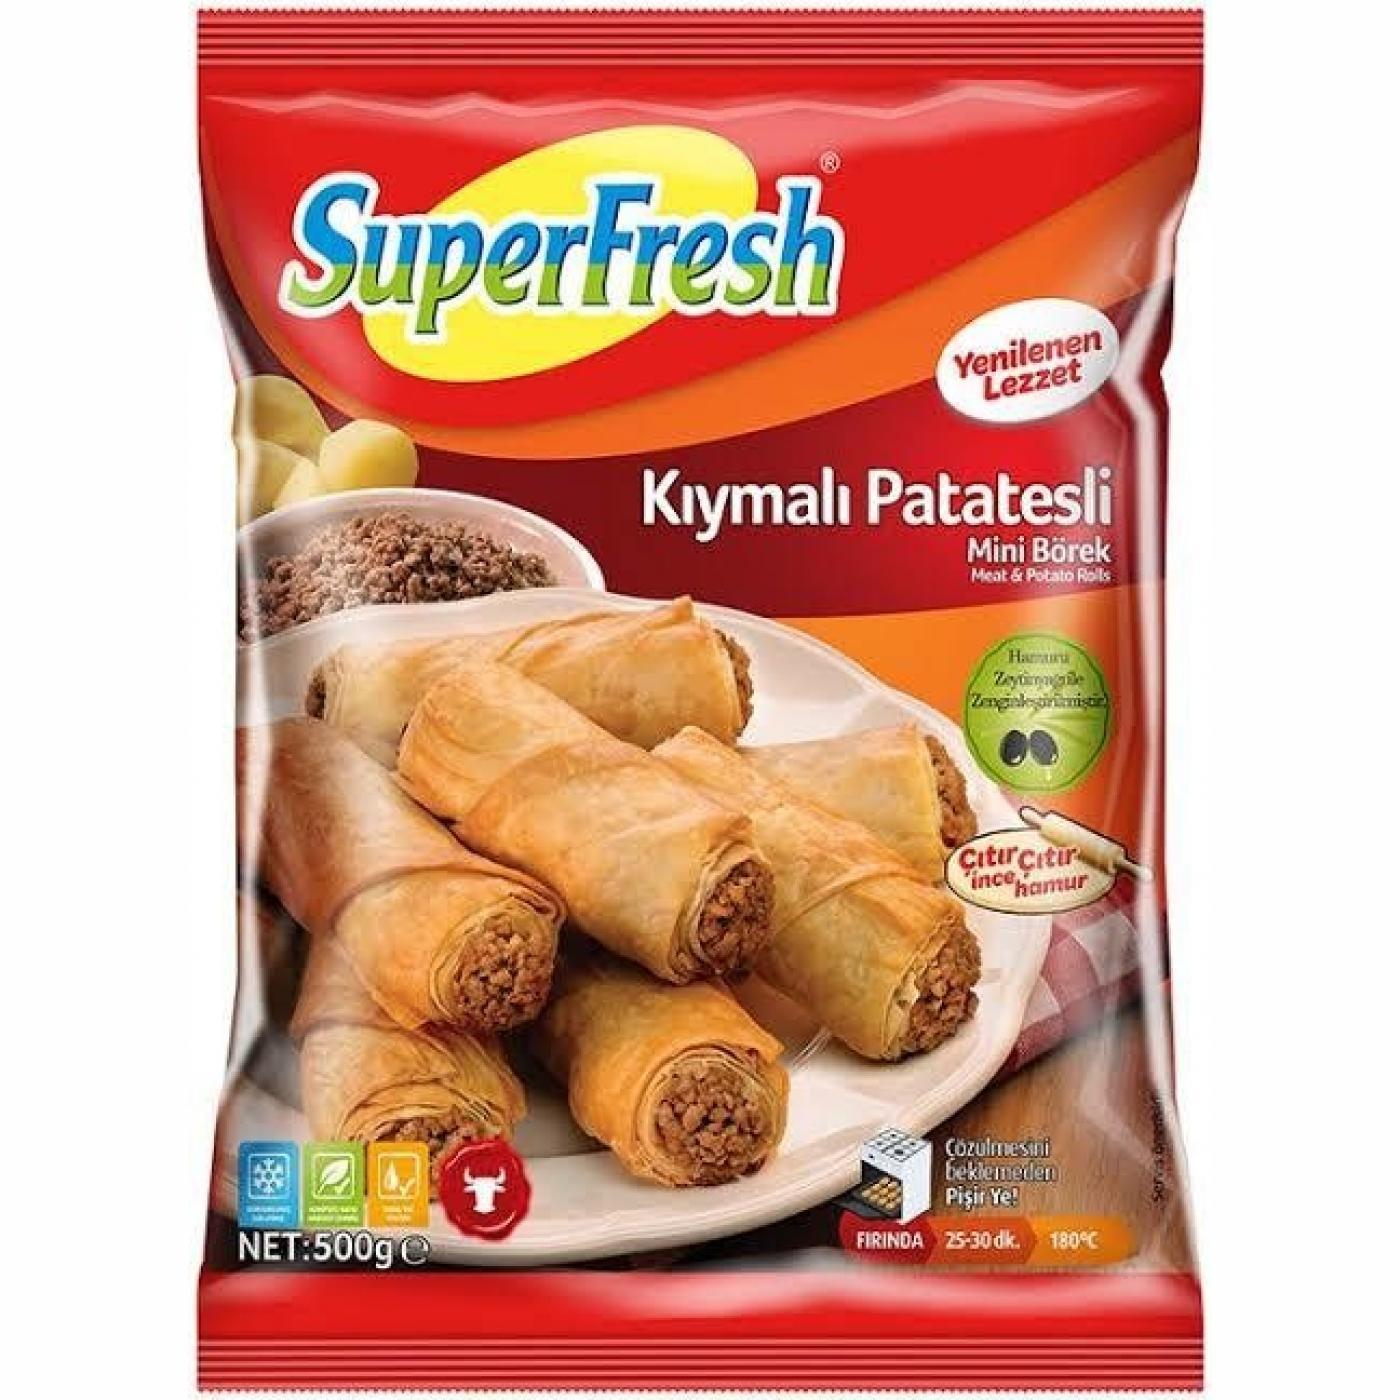 SUPERFRESH BÖREK 500GR KIYMALI PATATESLİ